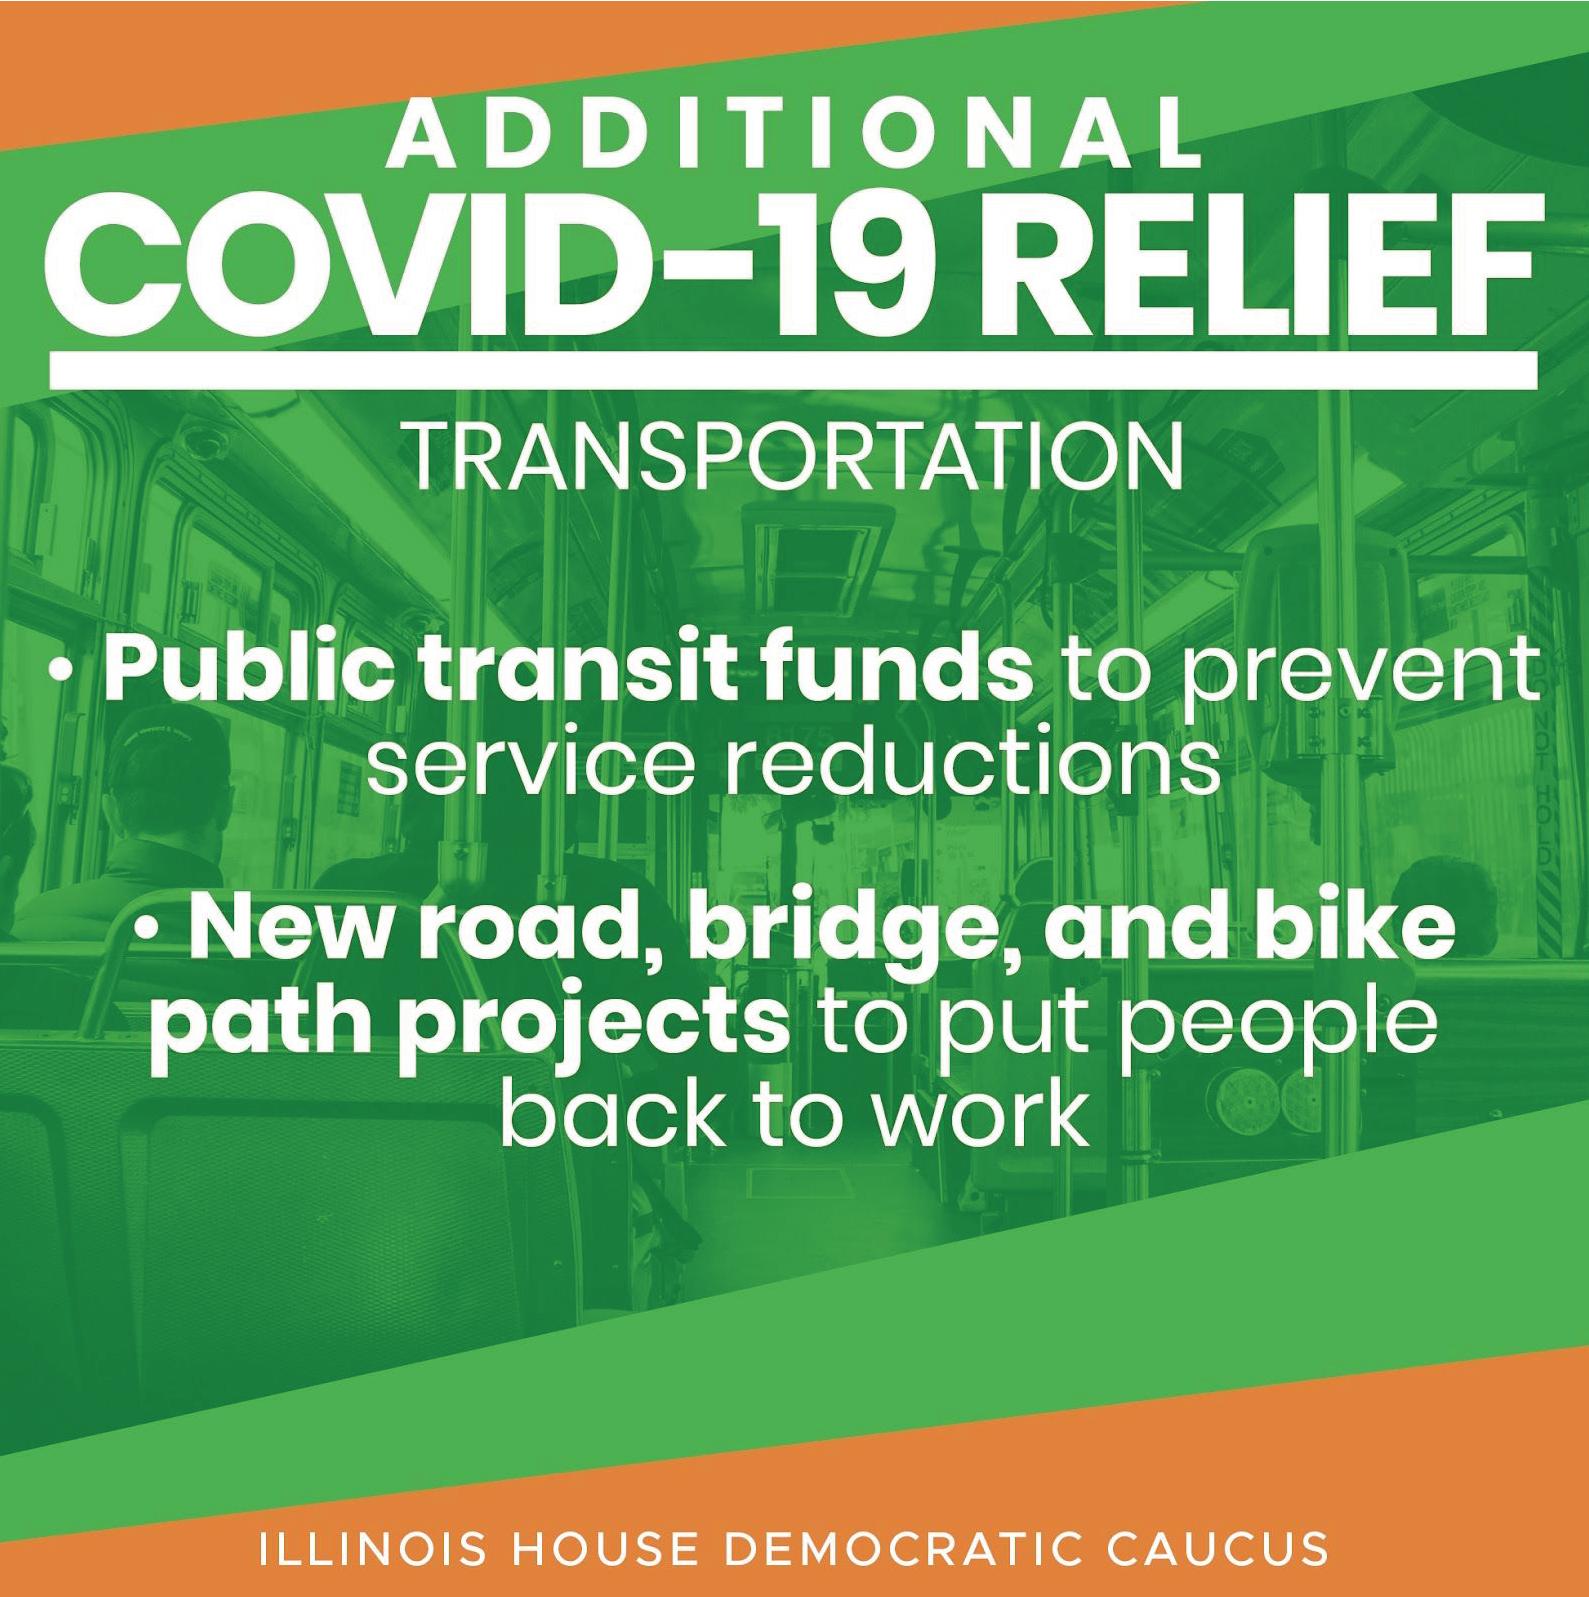 COVID-19 RELIEF: Transportation